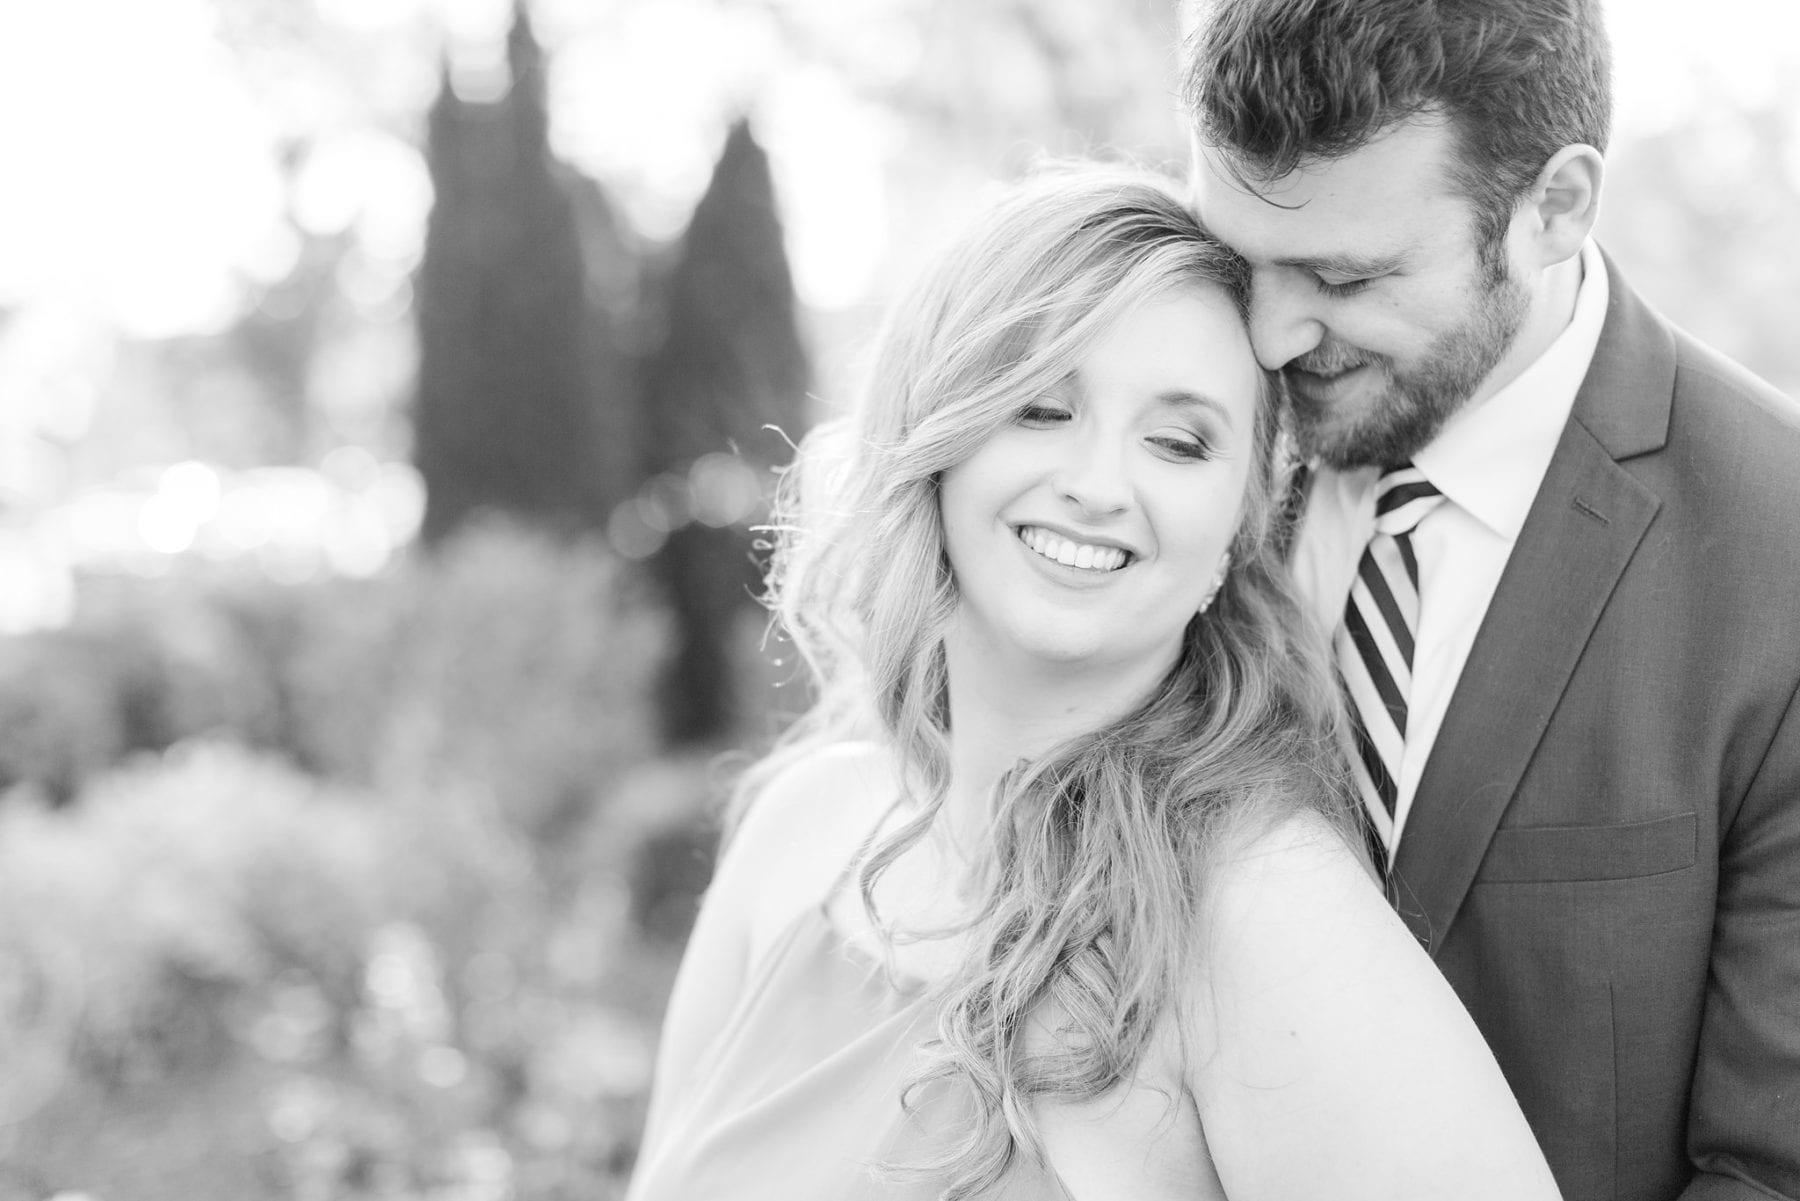 Capitol Hill Engagement Photos Kelly & Zach Washington DC Wedding Photographer Megan Kelsey Photography-21.jpg